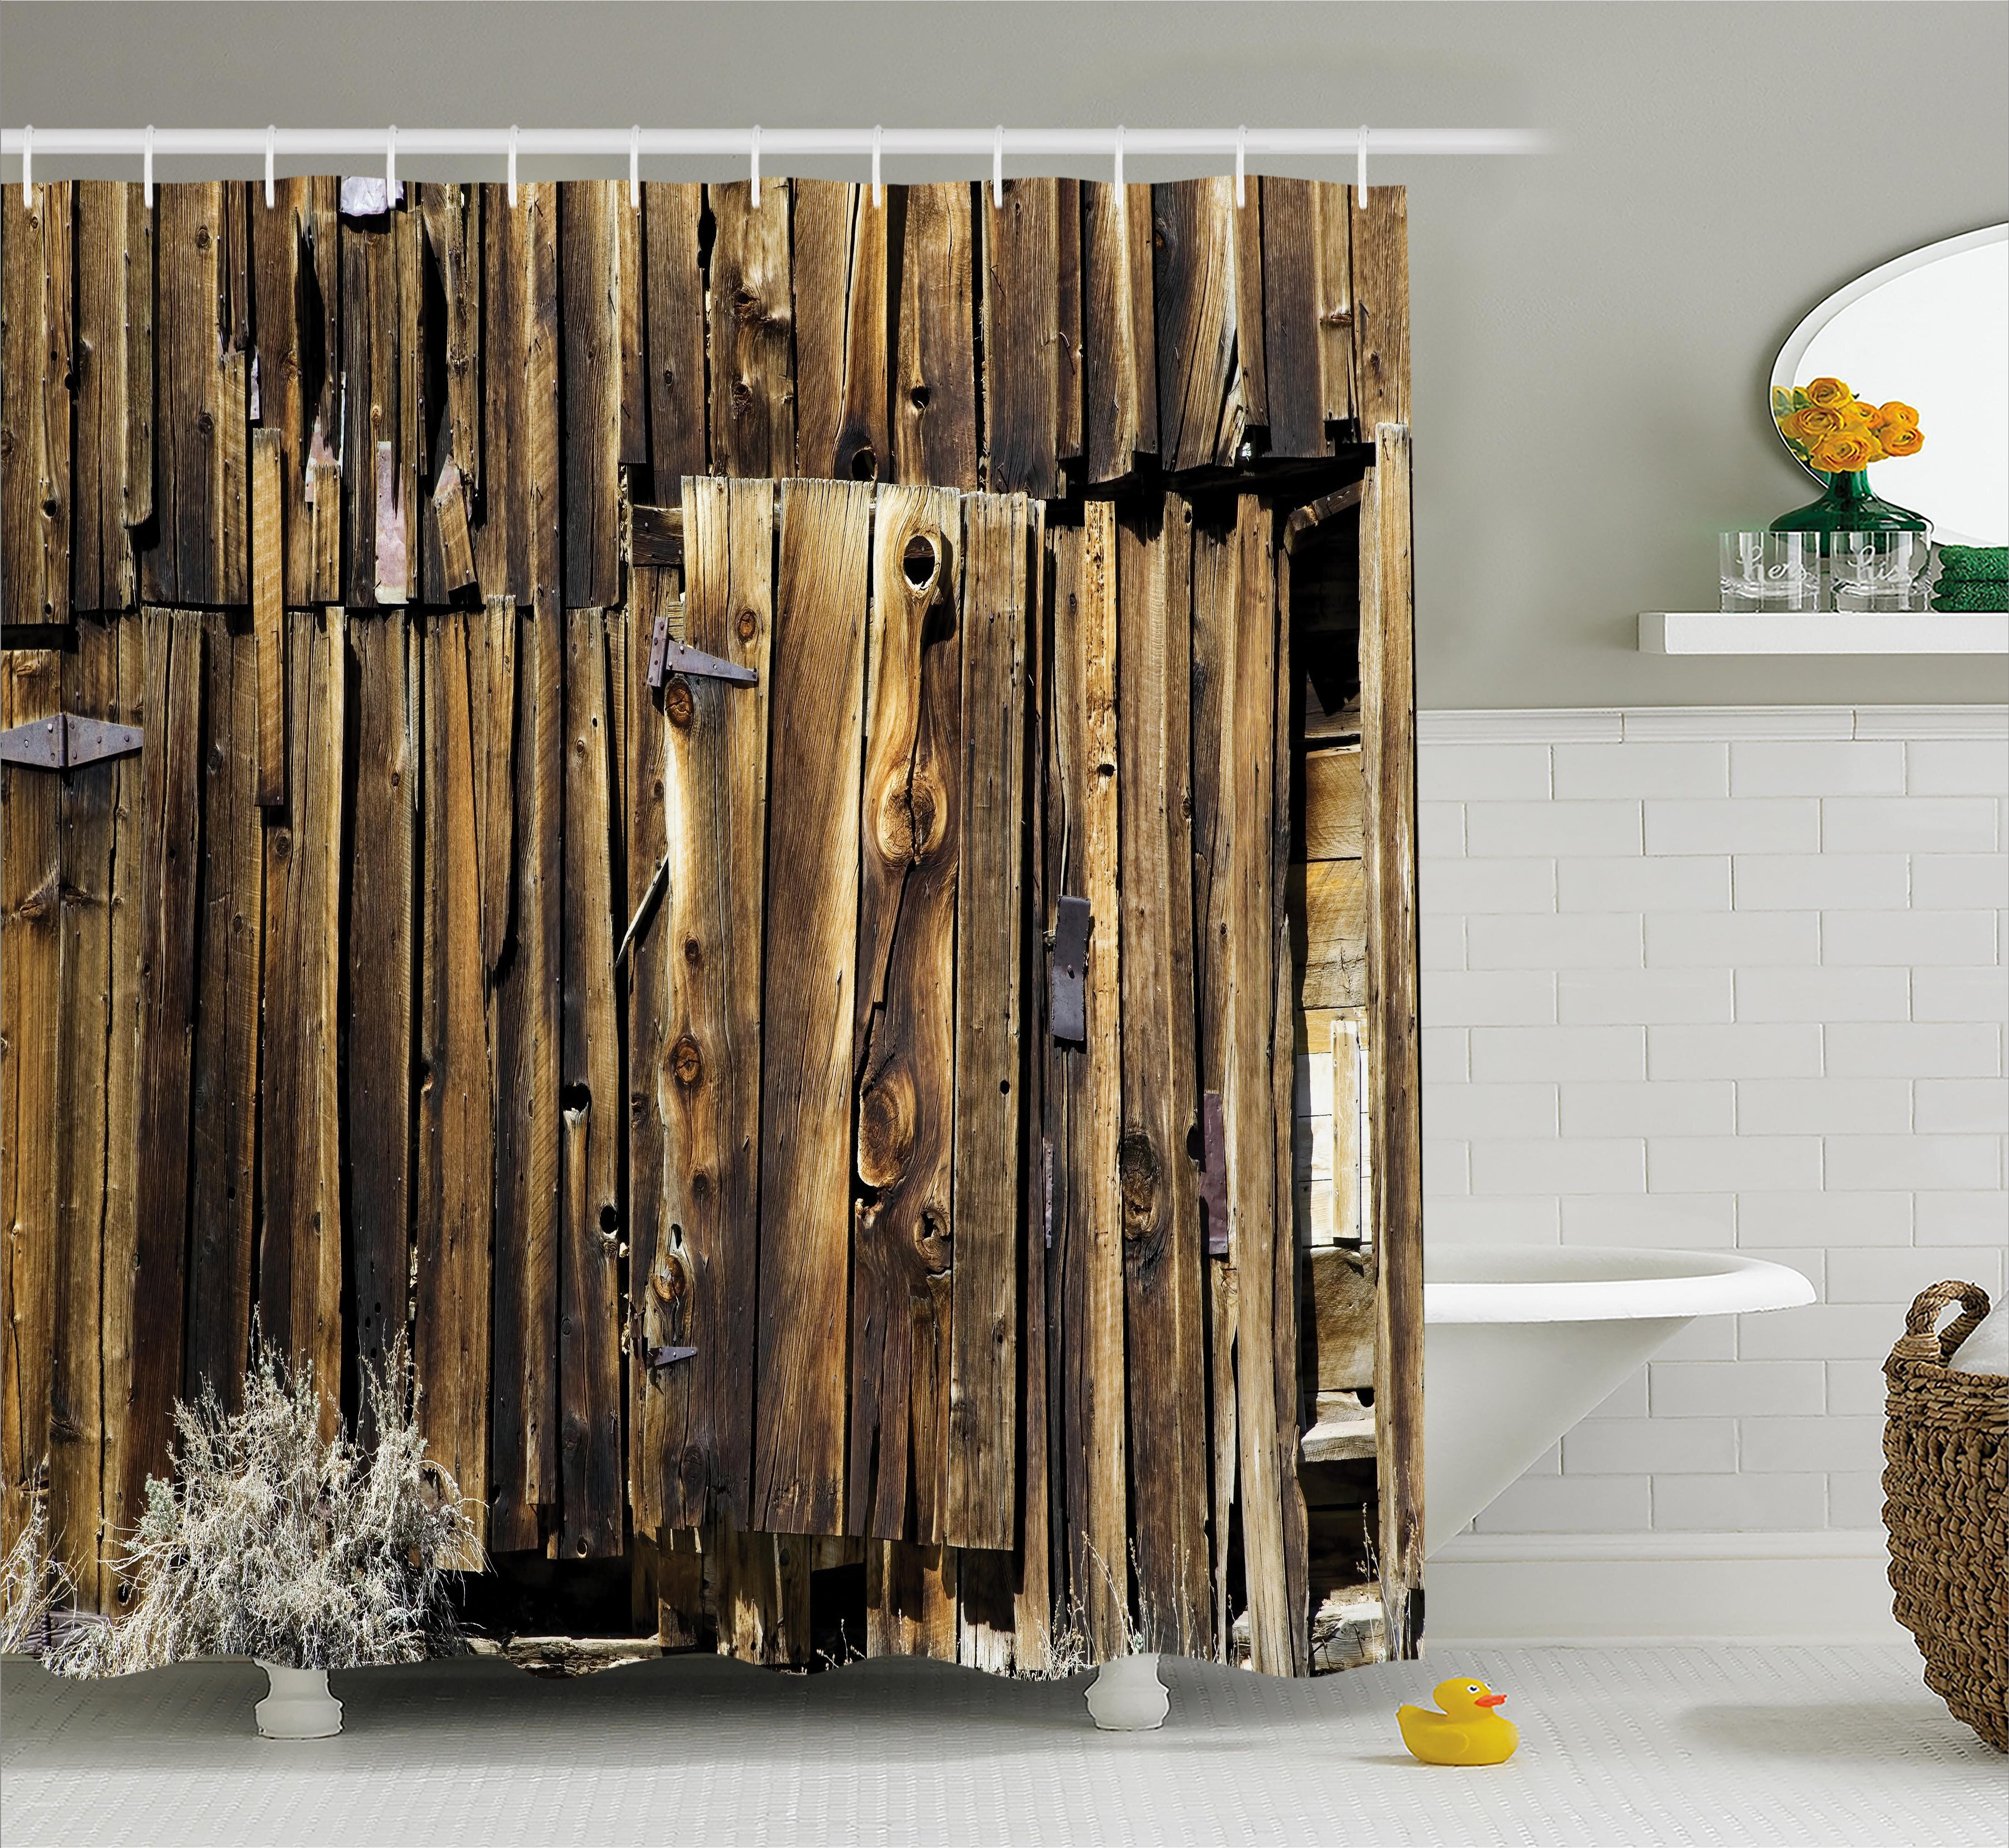 East Urban Home Rustic Oak Barn Timber Door Shower Curtain Reviews